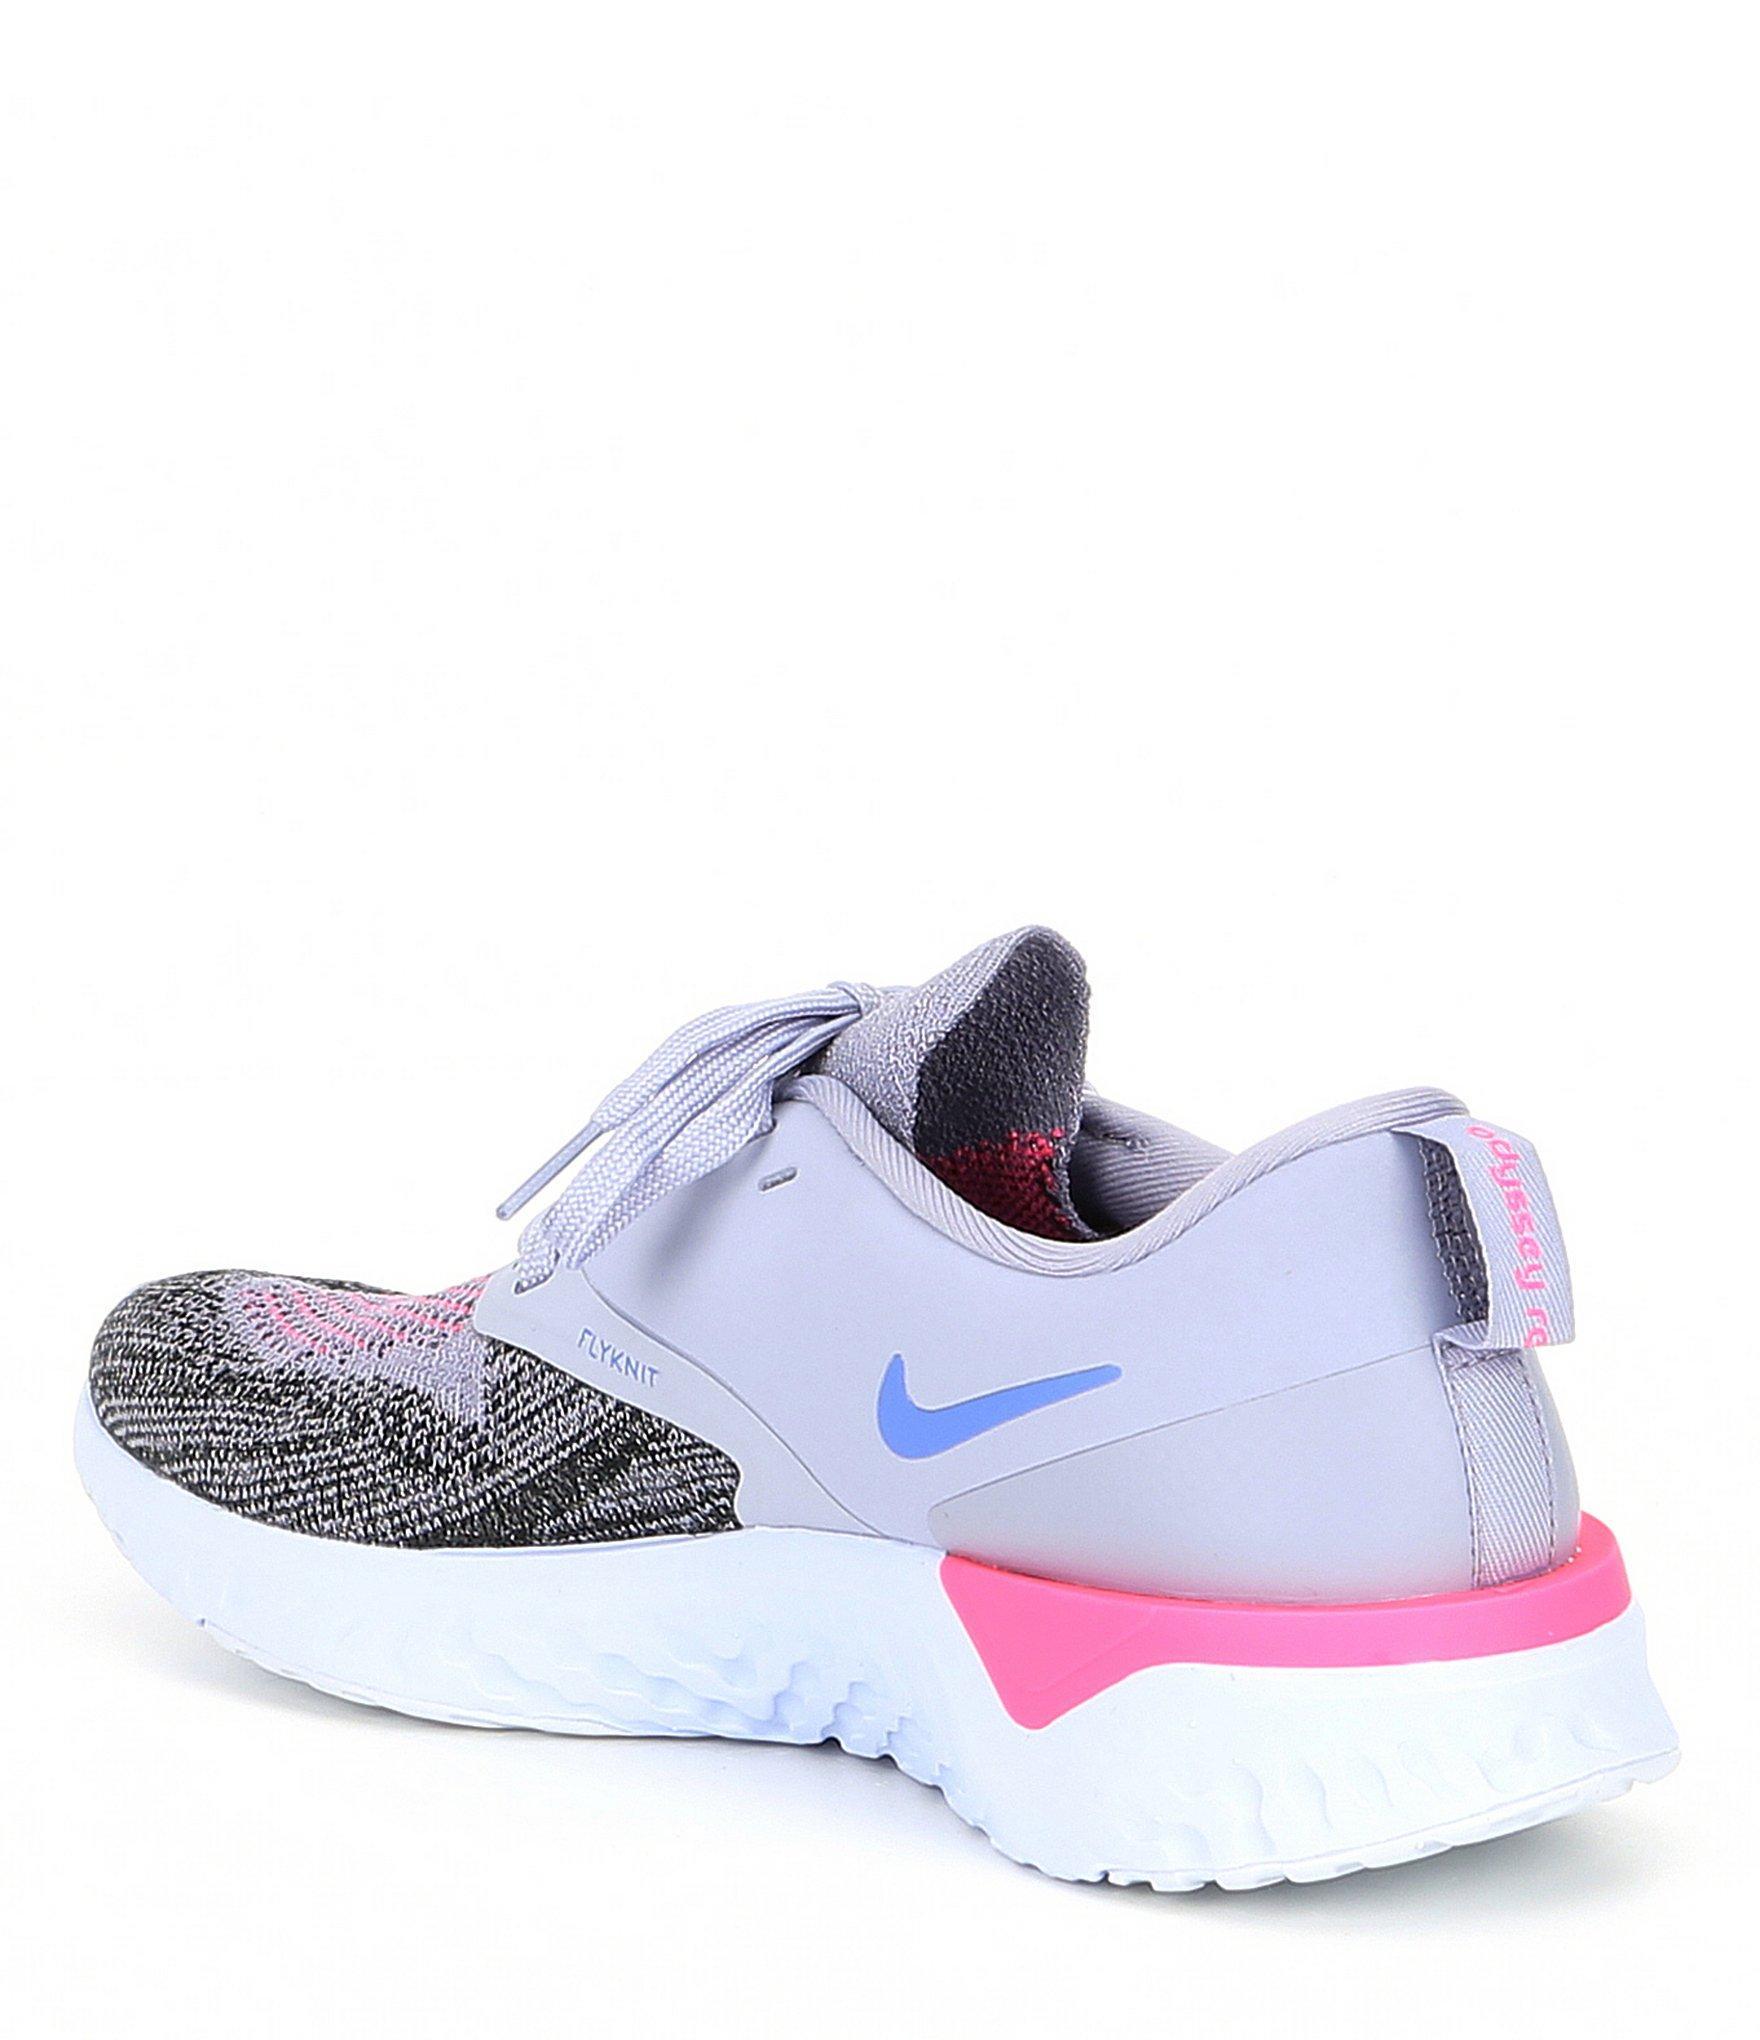 9cd80097e Nike - Purple Women s Odyssey React 2 Flyknit Running Shoe - Lyst. View  fullscreen